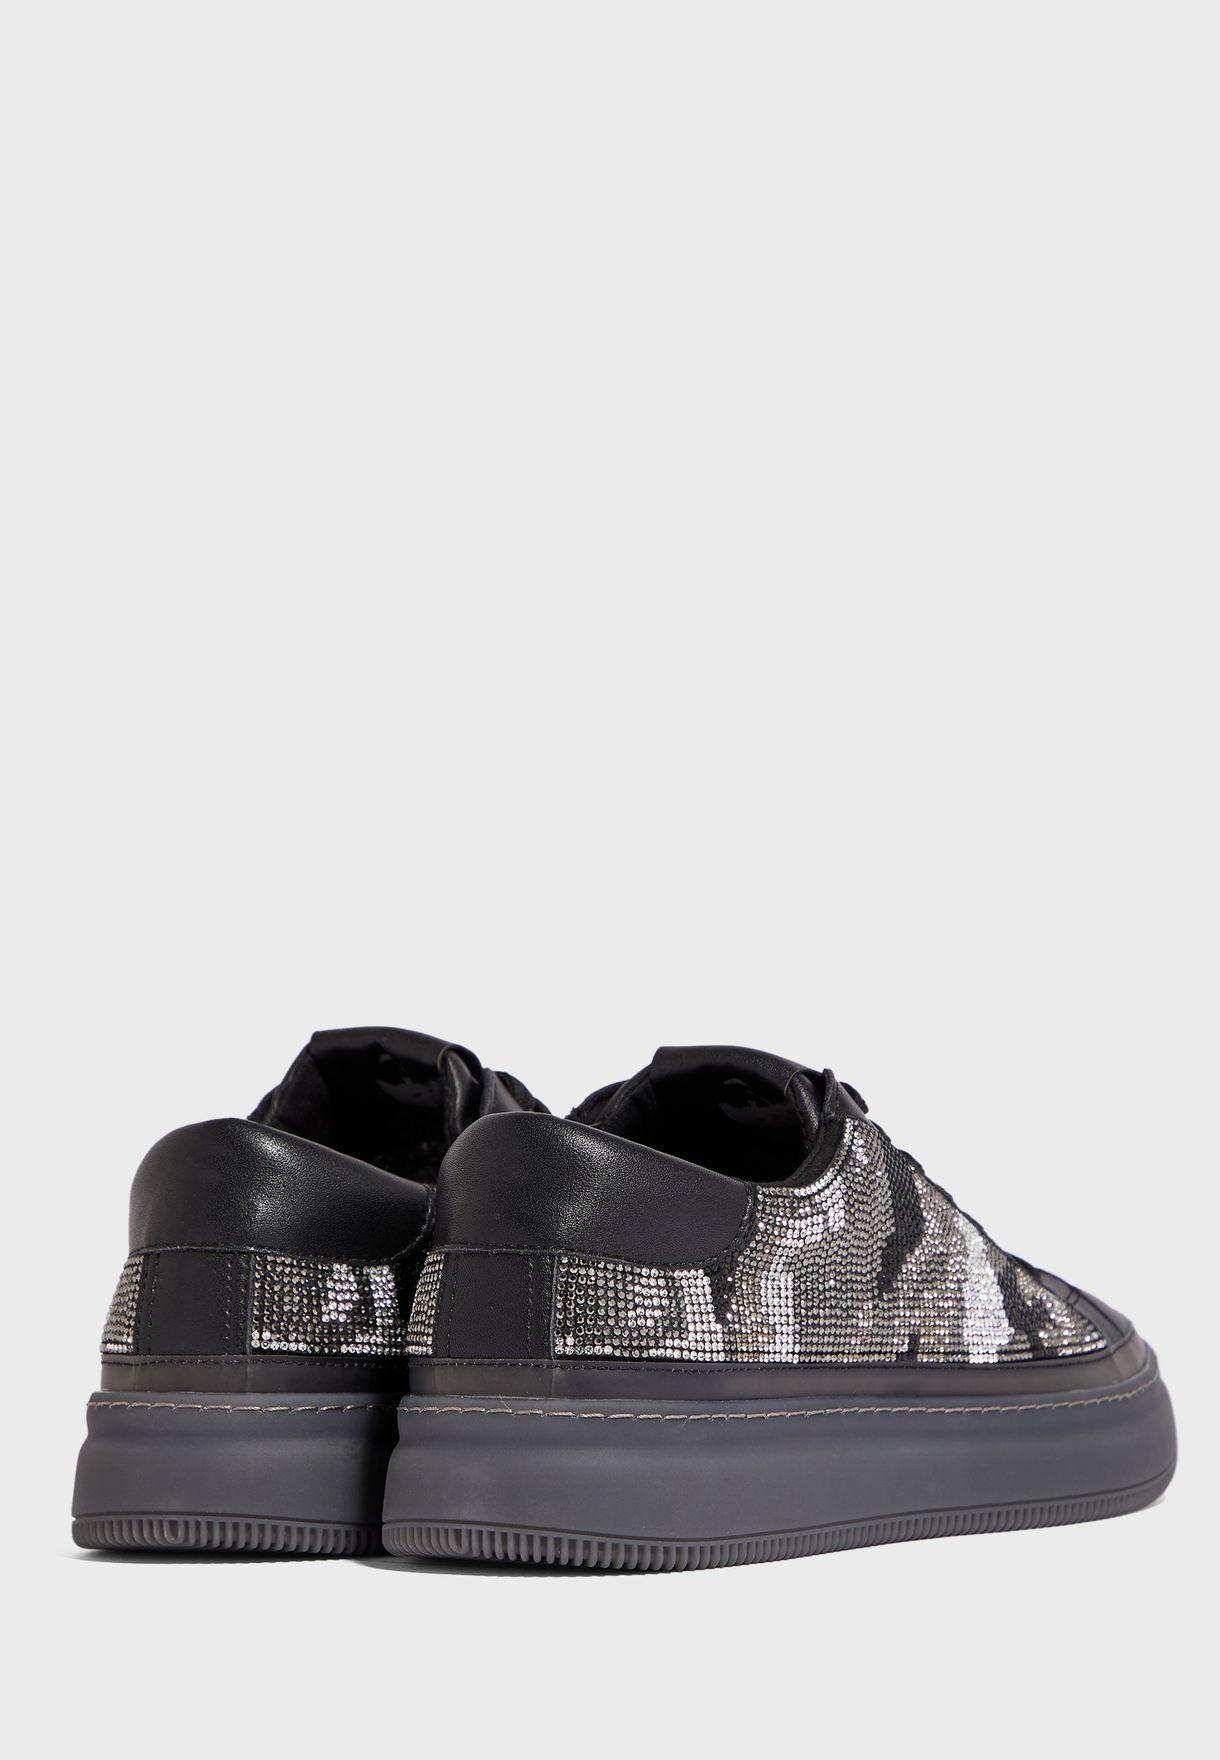 حذاء سنيكرز مزين بدبابيس